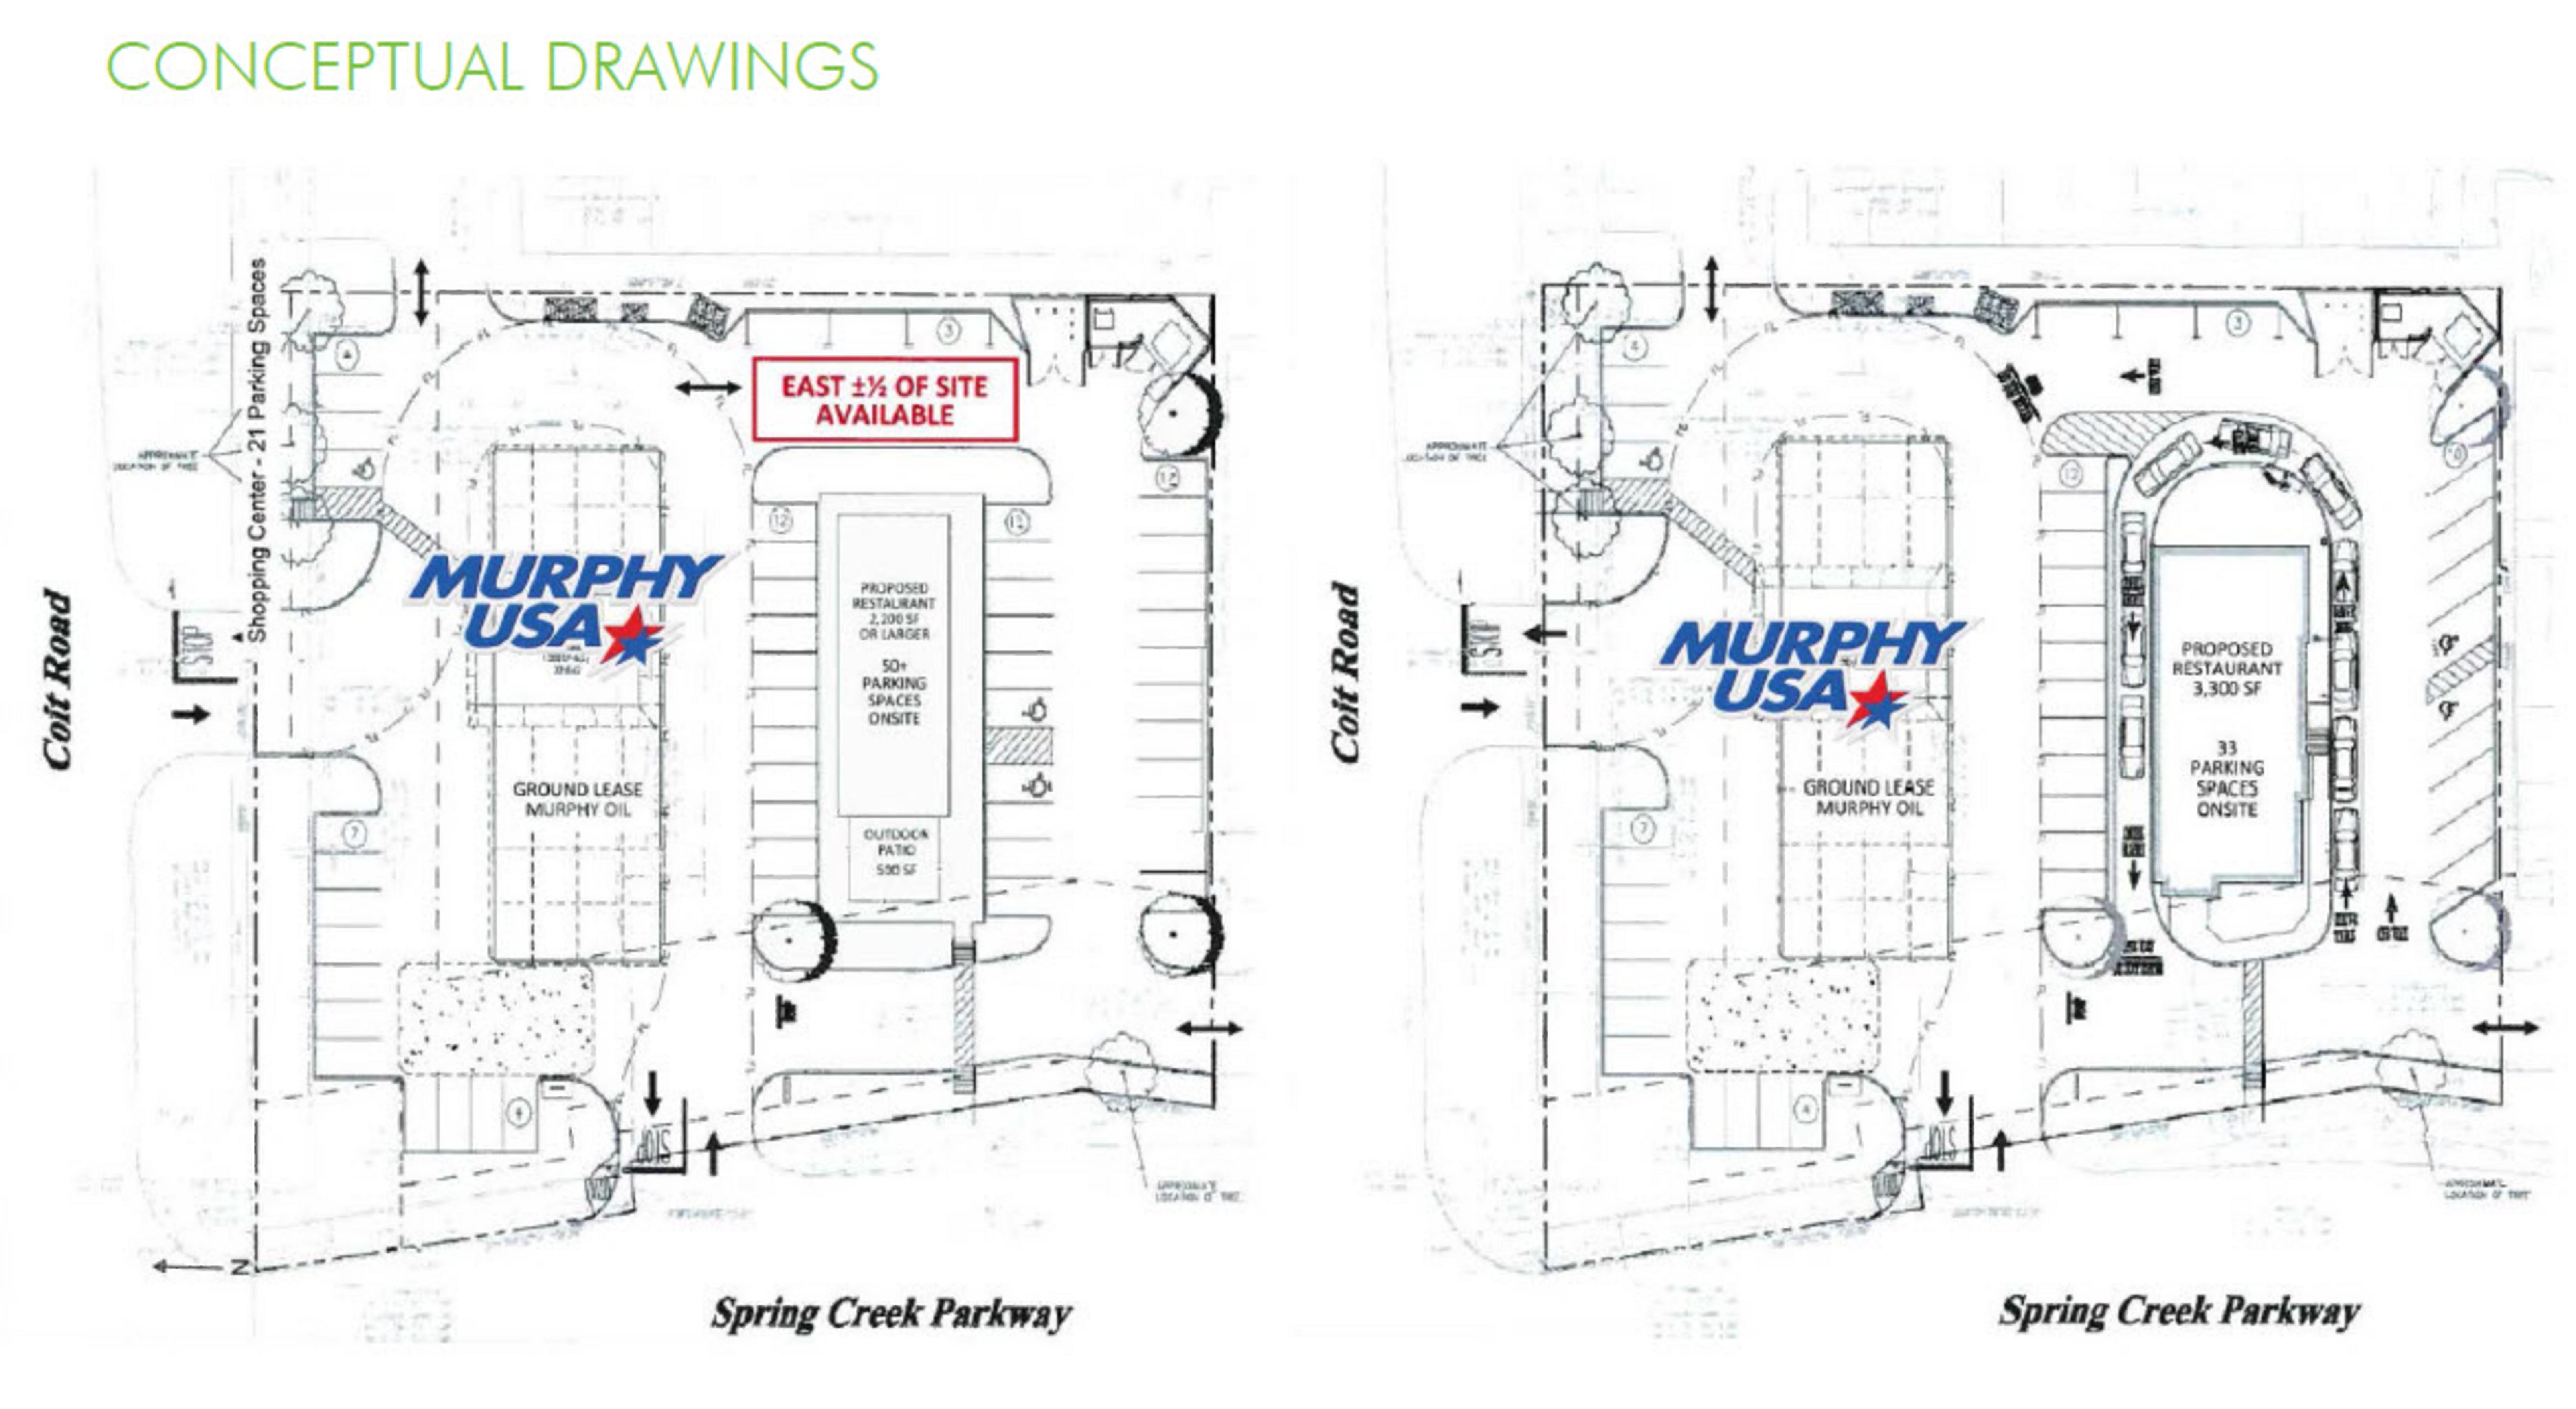 W Spring Creek Pkwy & Coit Rd Pad Site Rd: site plan